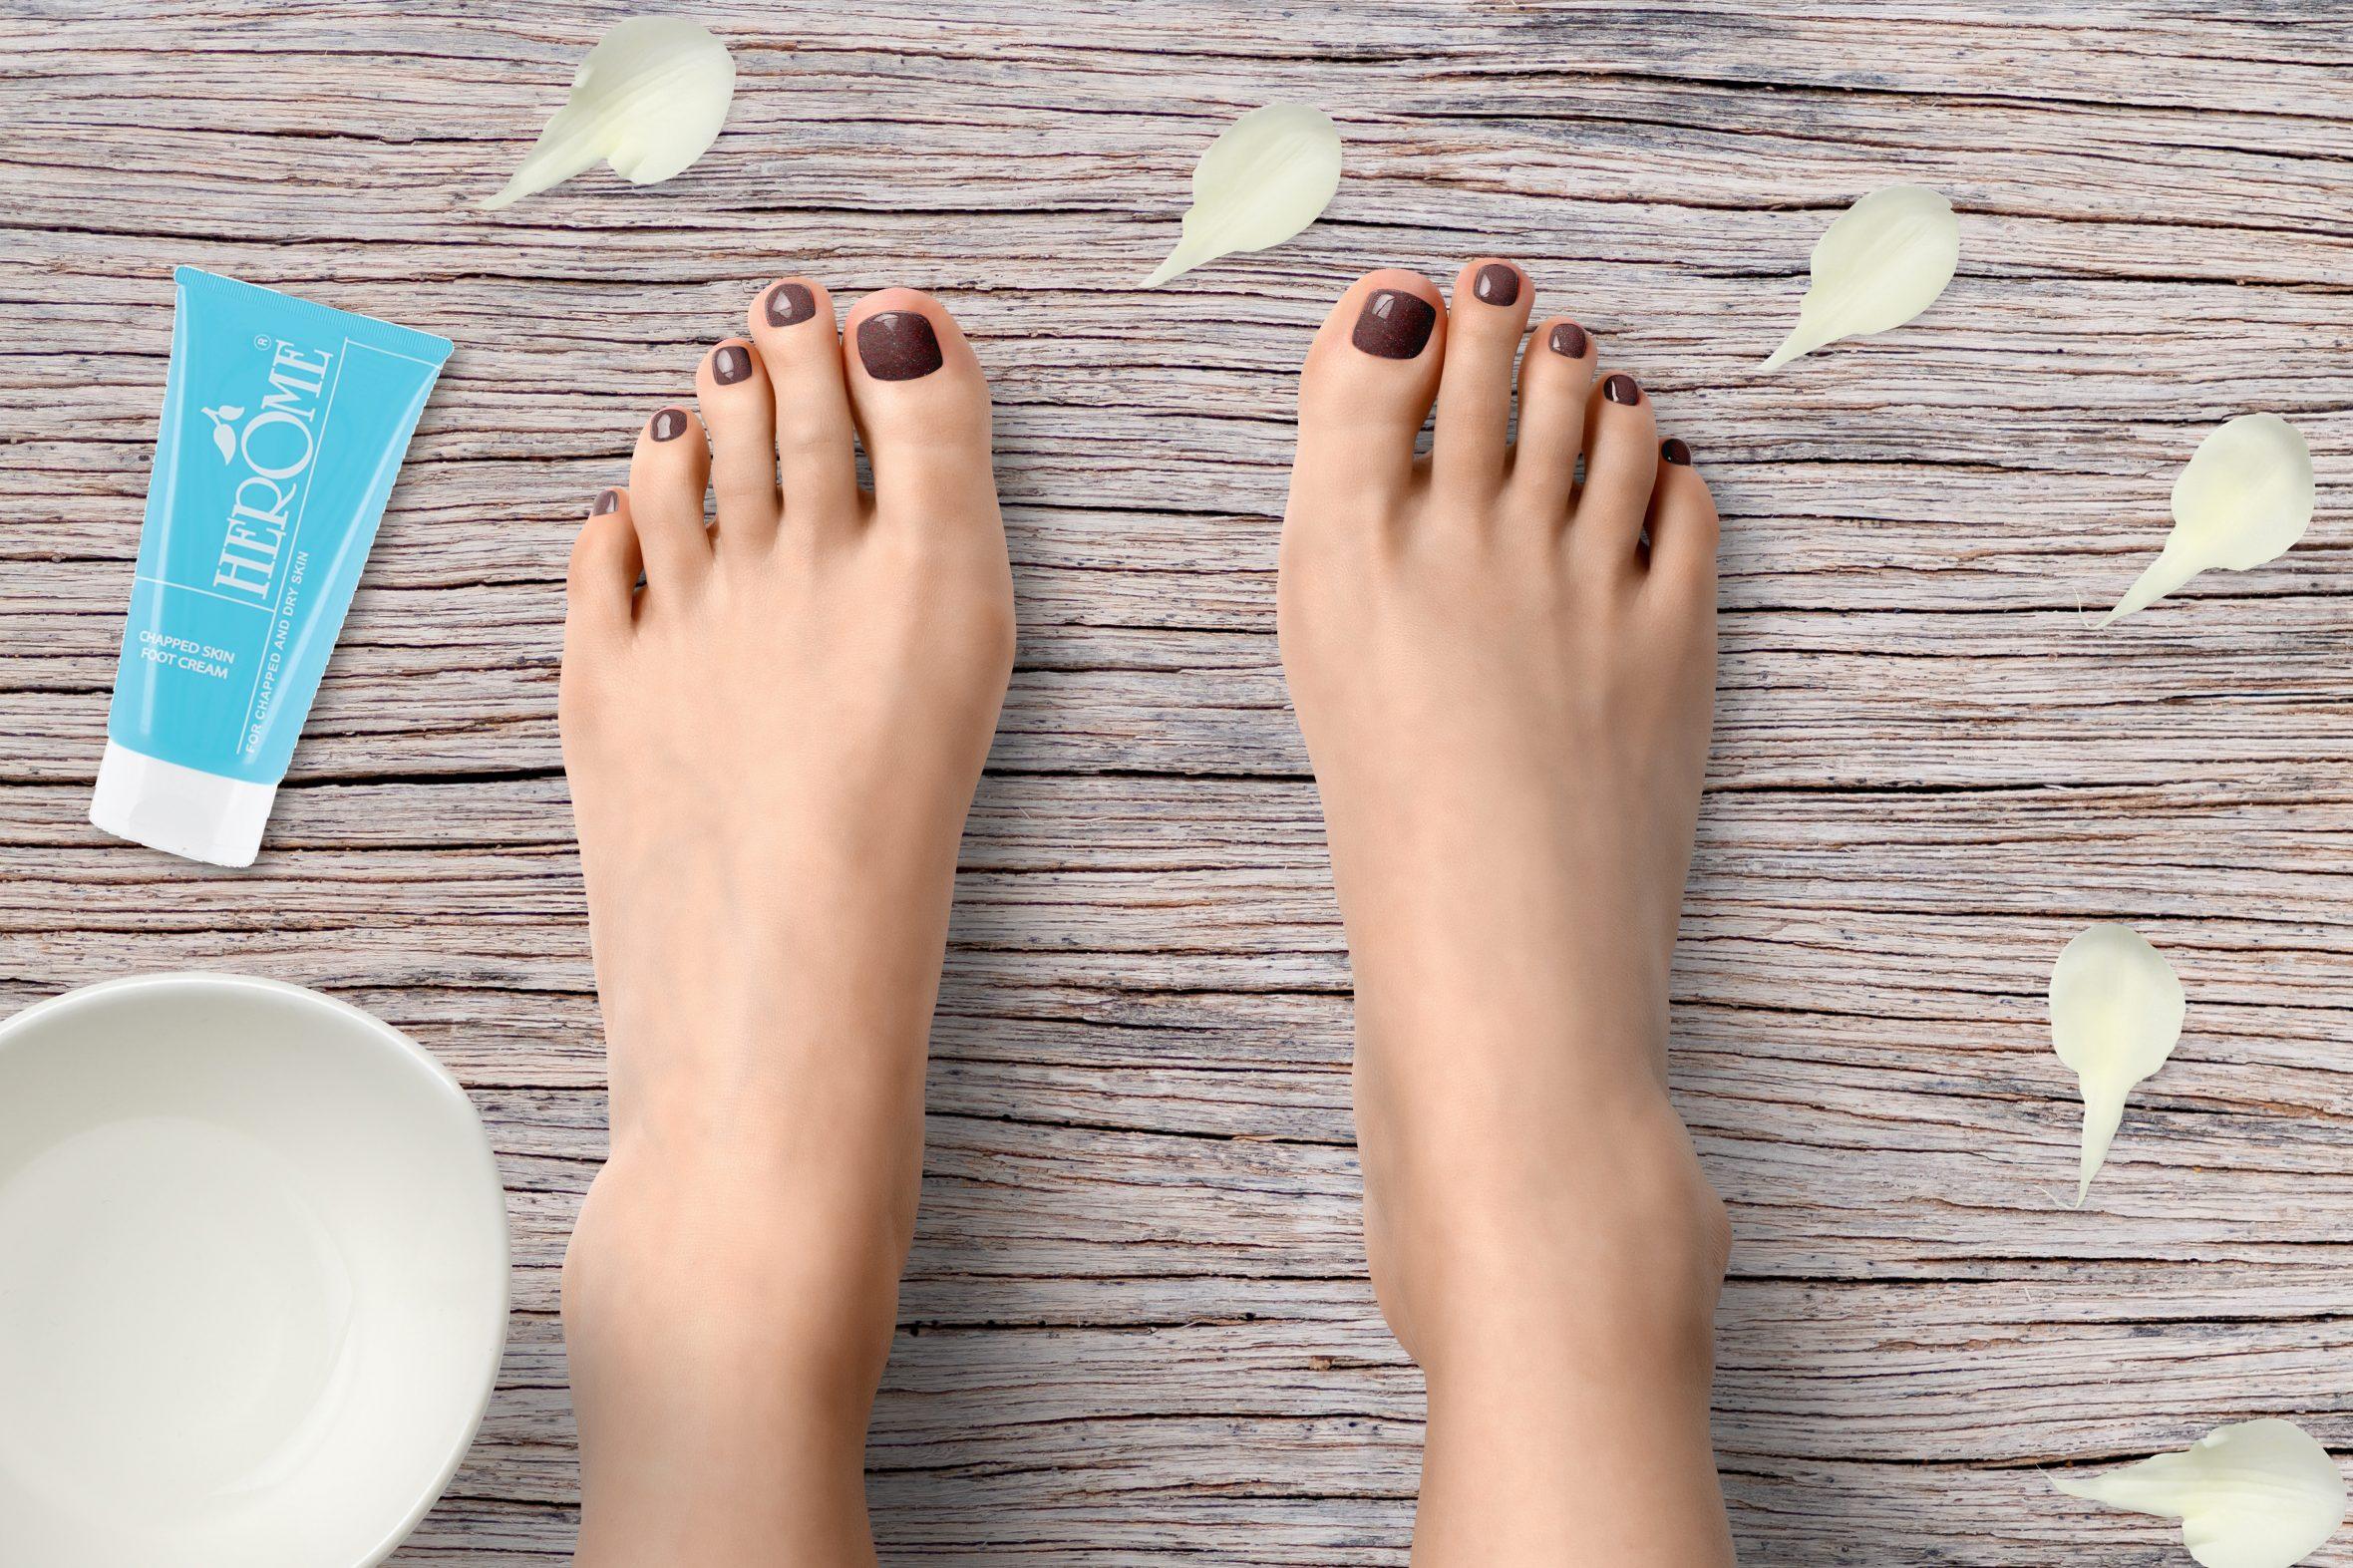 Herôme glitter nagellak nummer 135 voor lente/zomer pedicure